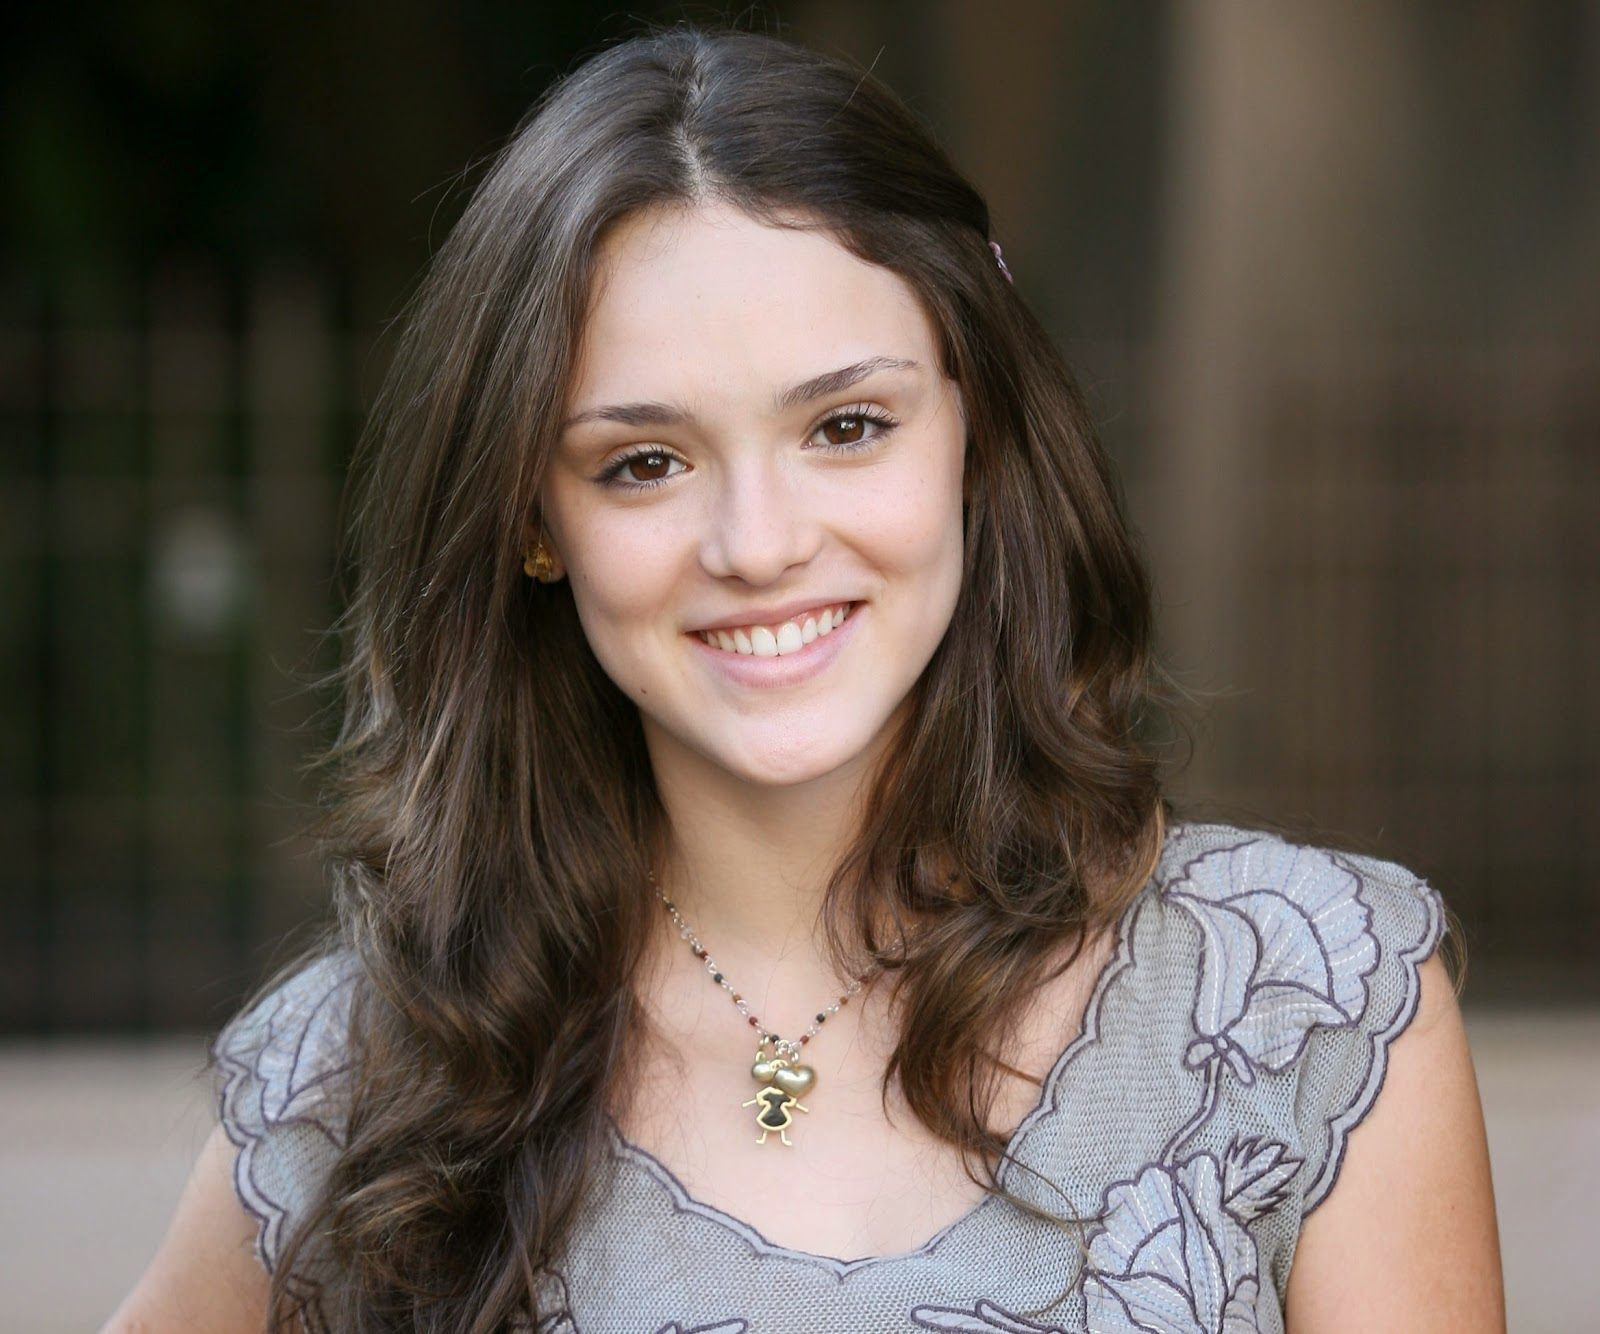 Isabelle Drummond-Biografia e Fotos